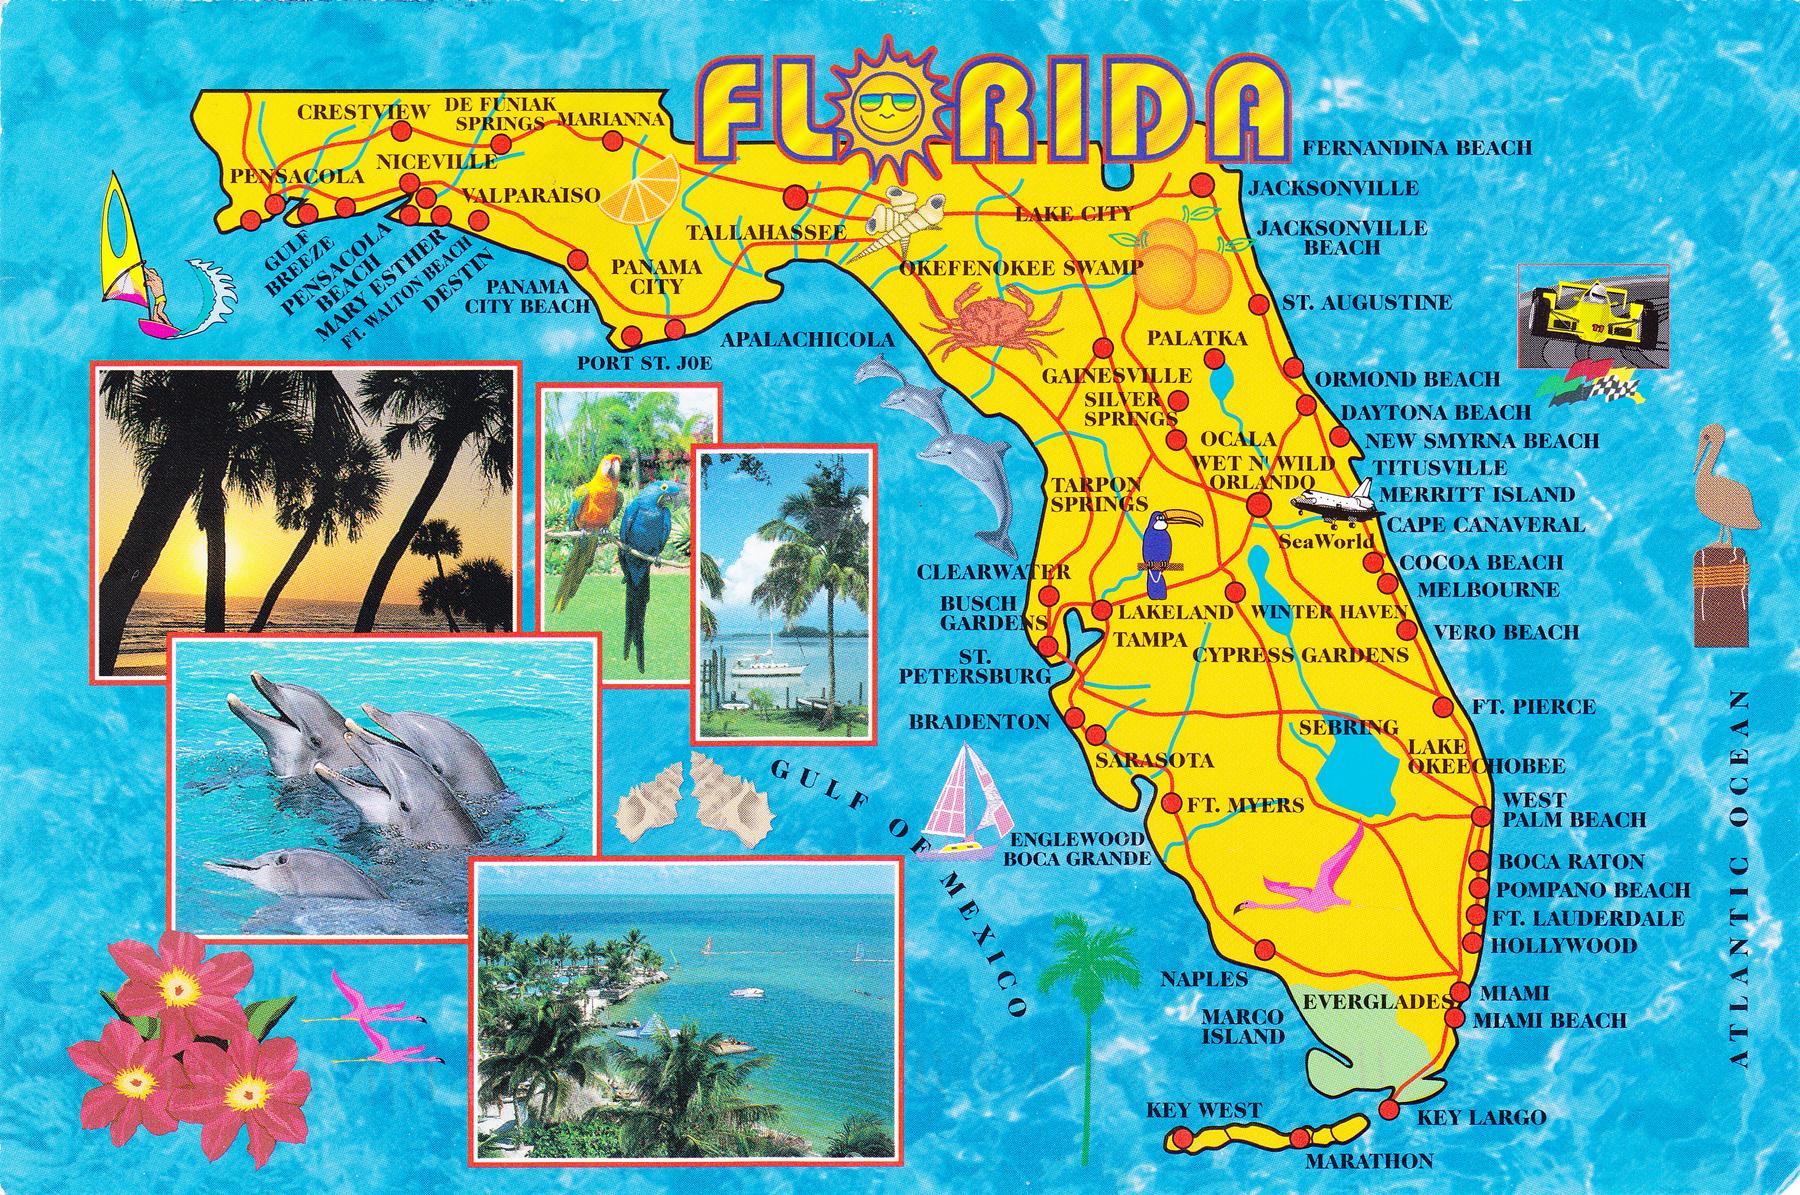 Mexico Beach Fl Map From Kolovrat 6 - Judecelestin2010 - Where Is Fort Walton Beach Florida On The Map